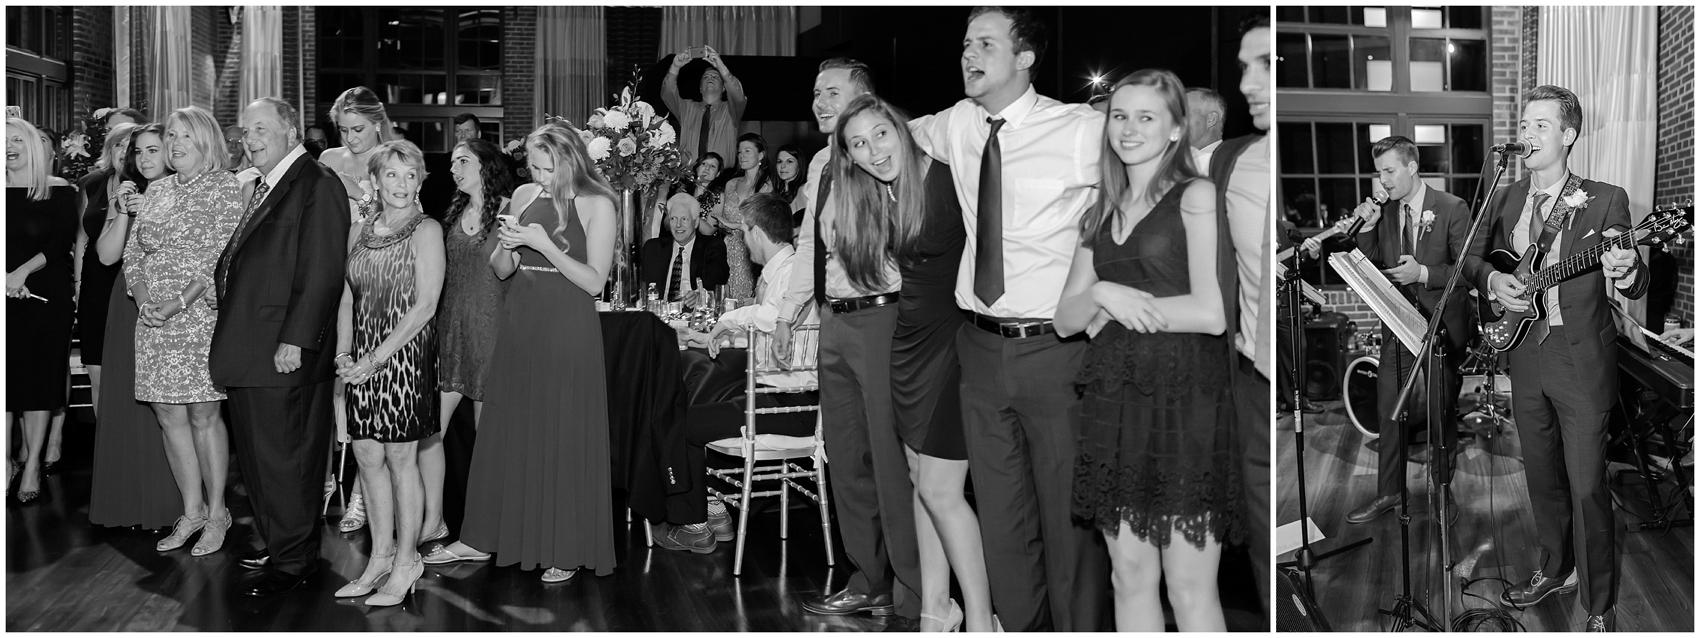 ritz-carlton-georgetown-wedding-washington-dc-photography-liz-stewart-photo-00054